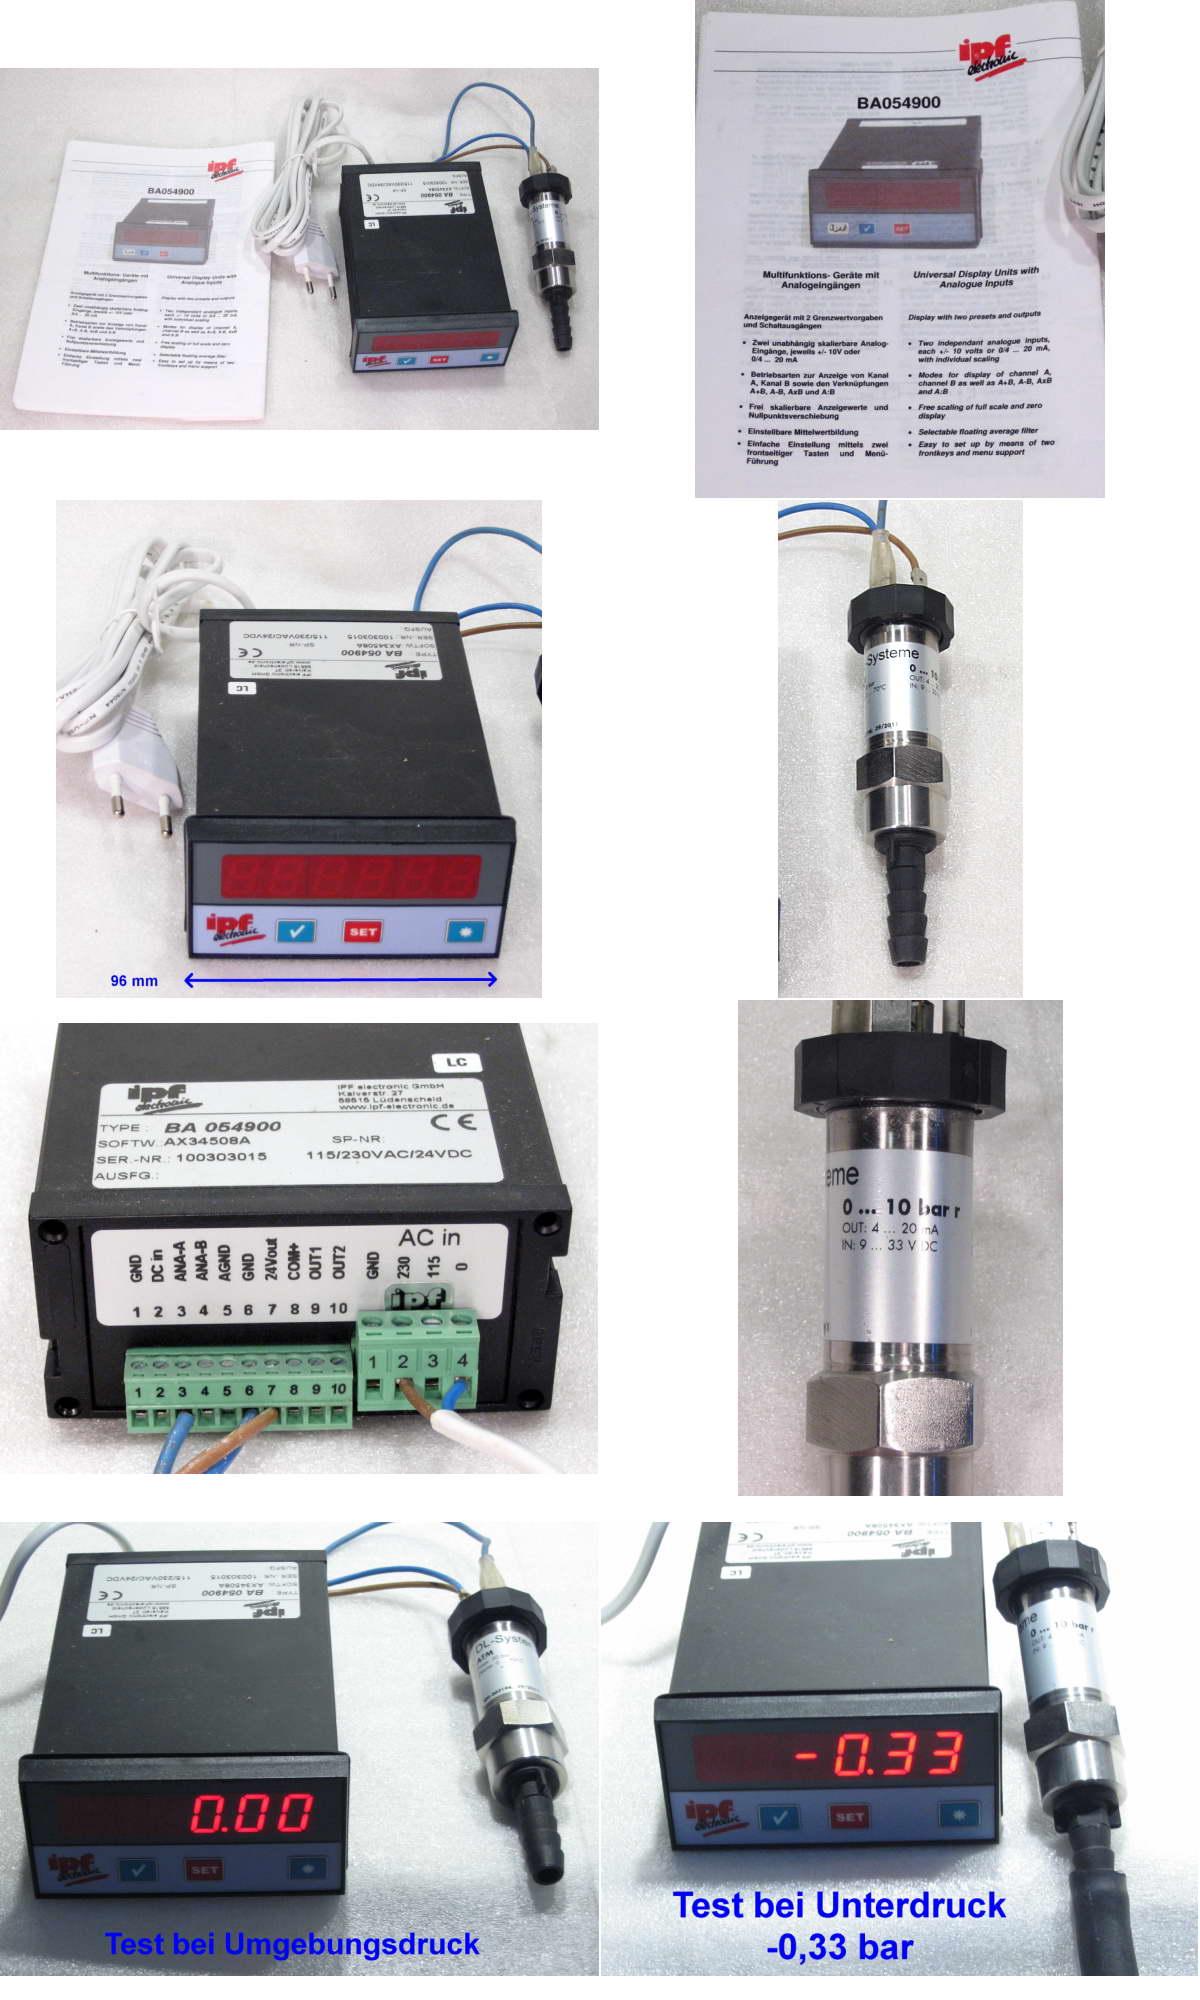 druck messger t vakuummeter manometer vacuum pressure meter gauge 1 10bar ebay. Black Bedroom Furniture Sets. Home Design Ideas